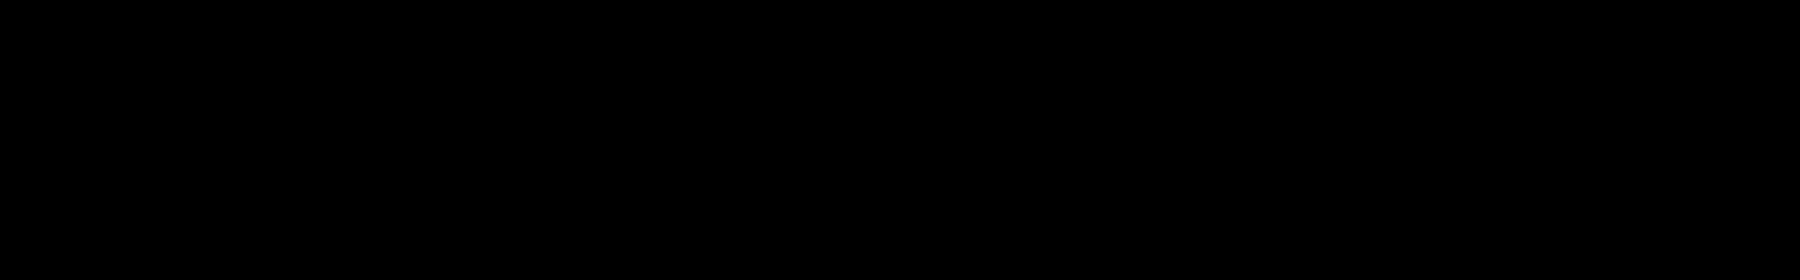 Vault audio waveform